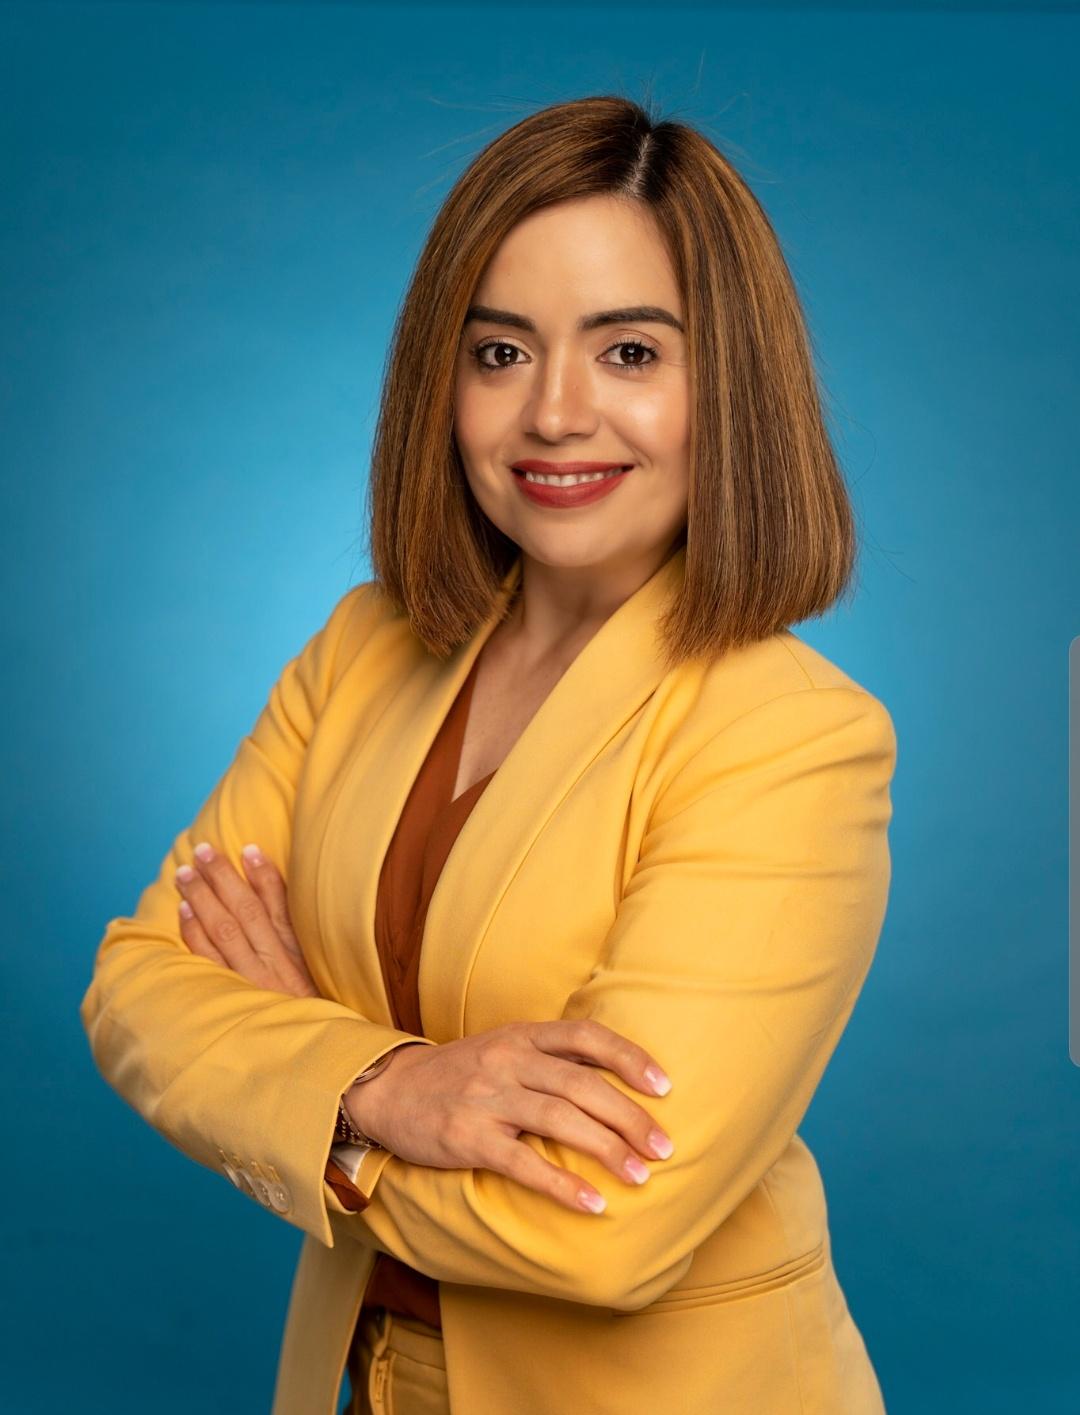 Monica Guzman